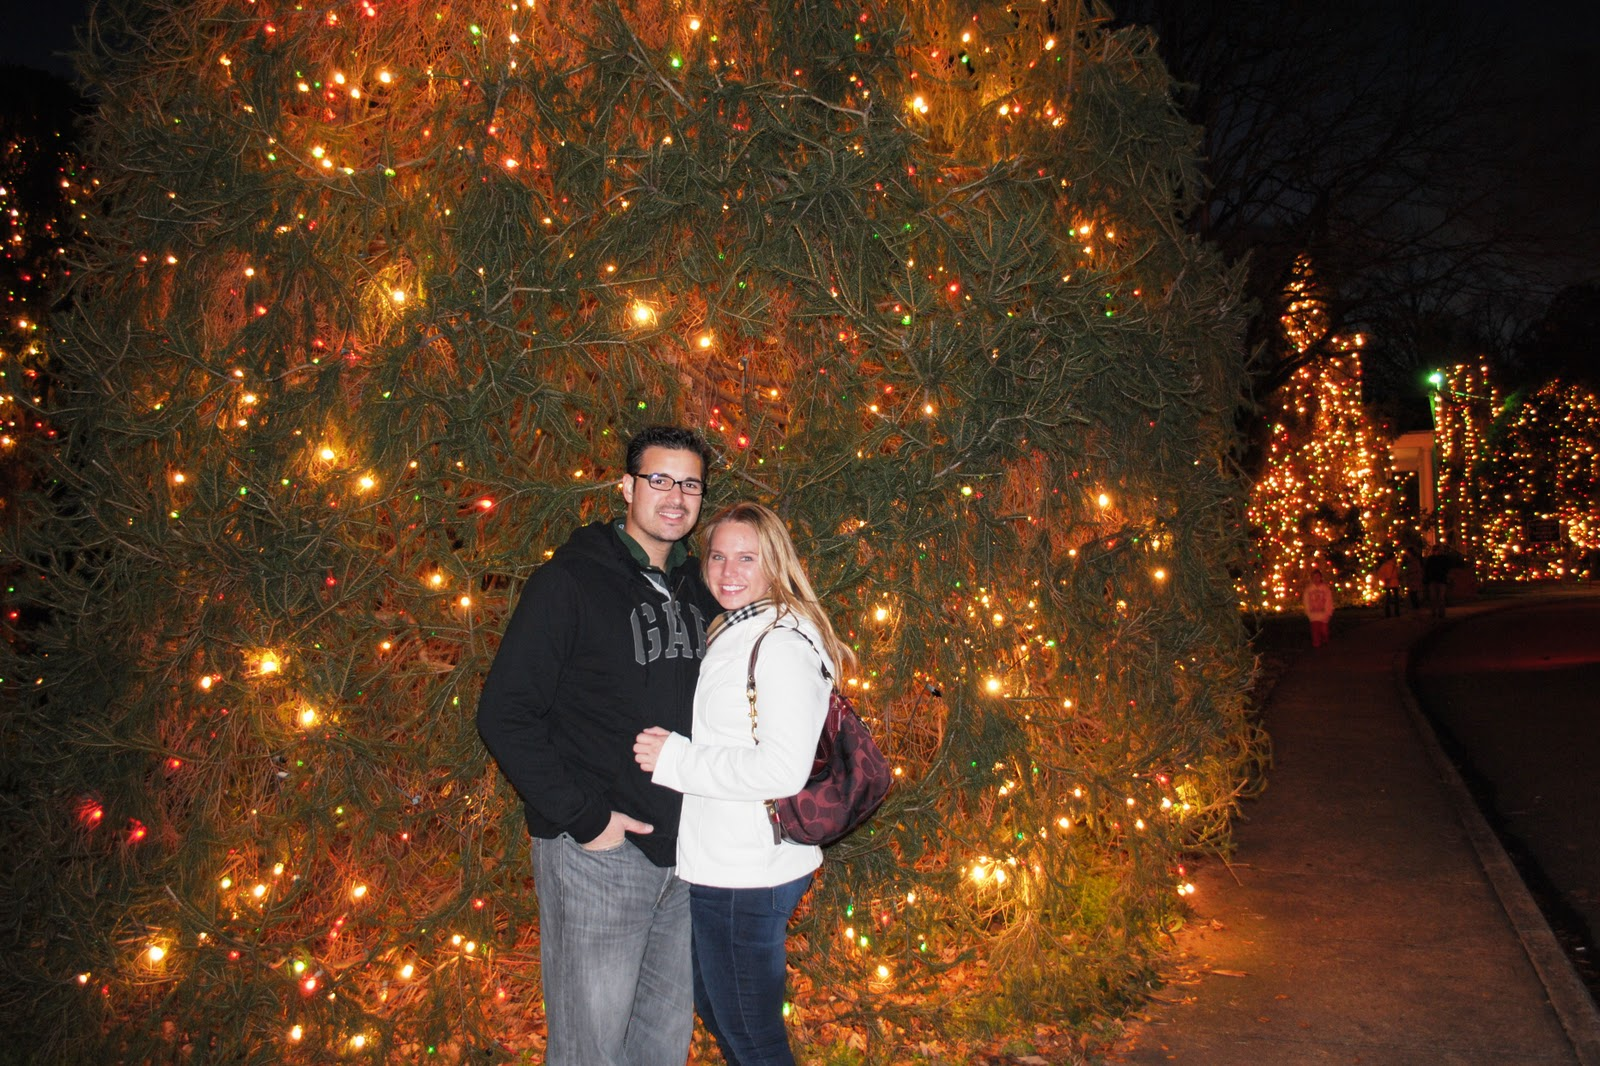 Best Christmas Cities: McAdenville - Christmas Town USA